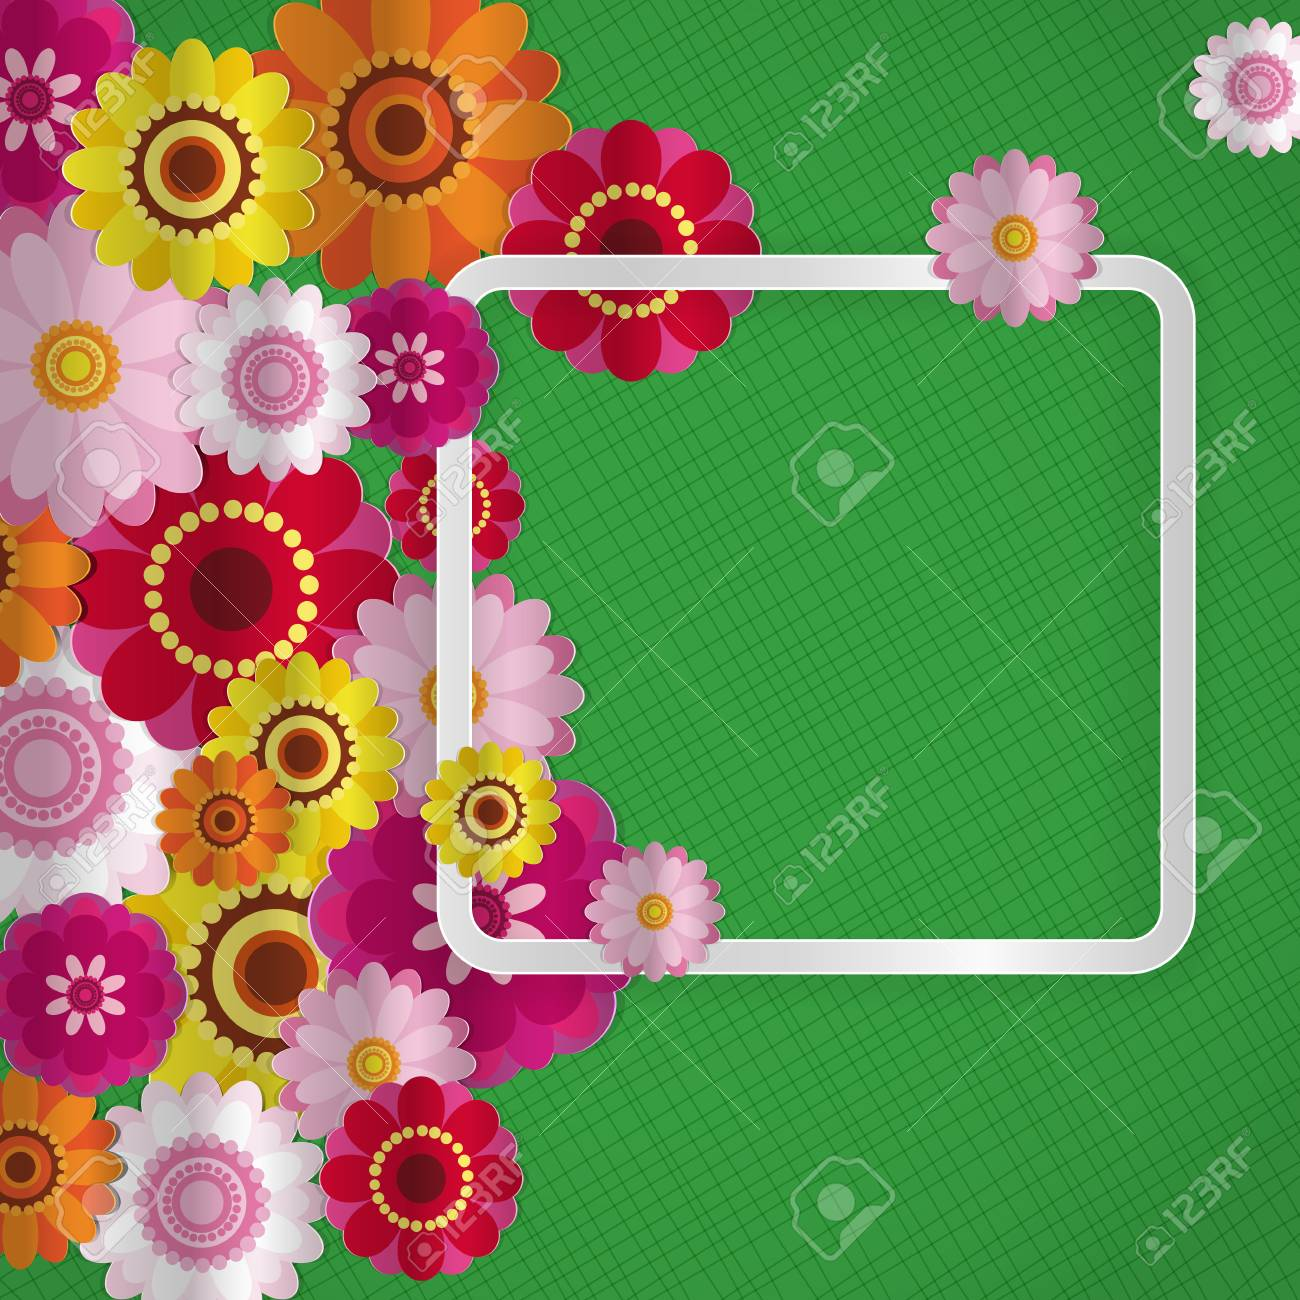 Fantástico Arte De Uñas Festivo Embellecimiento - Ideas de Pintar de ...